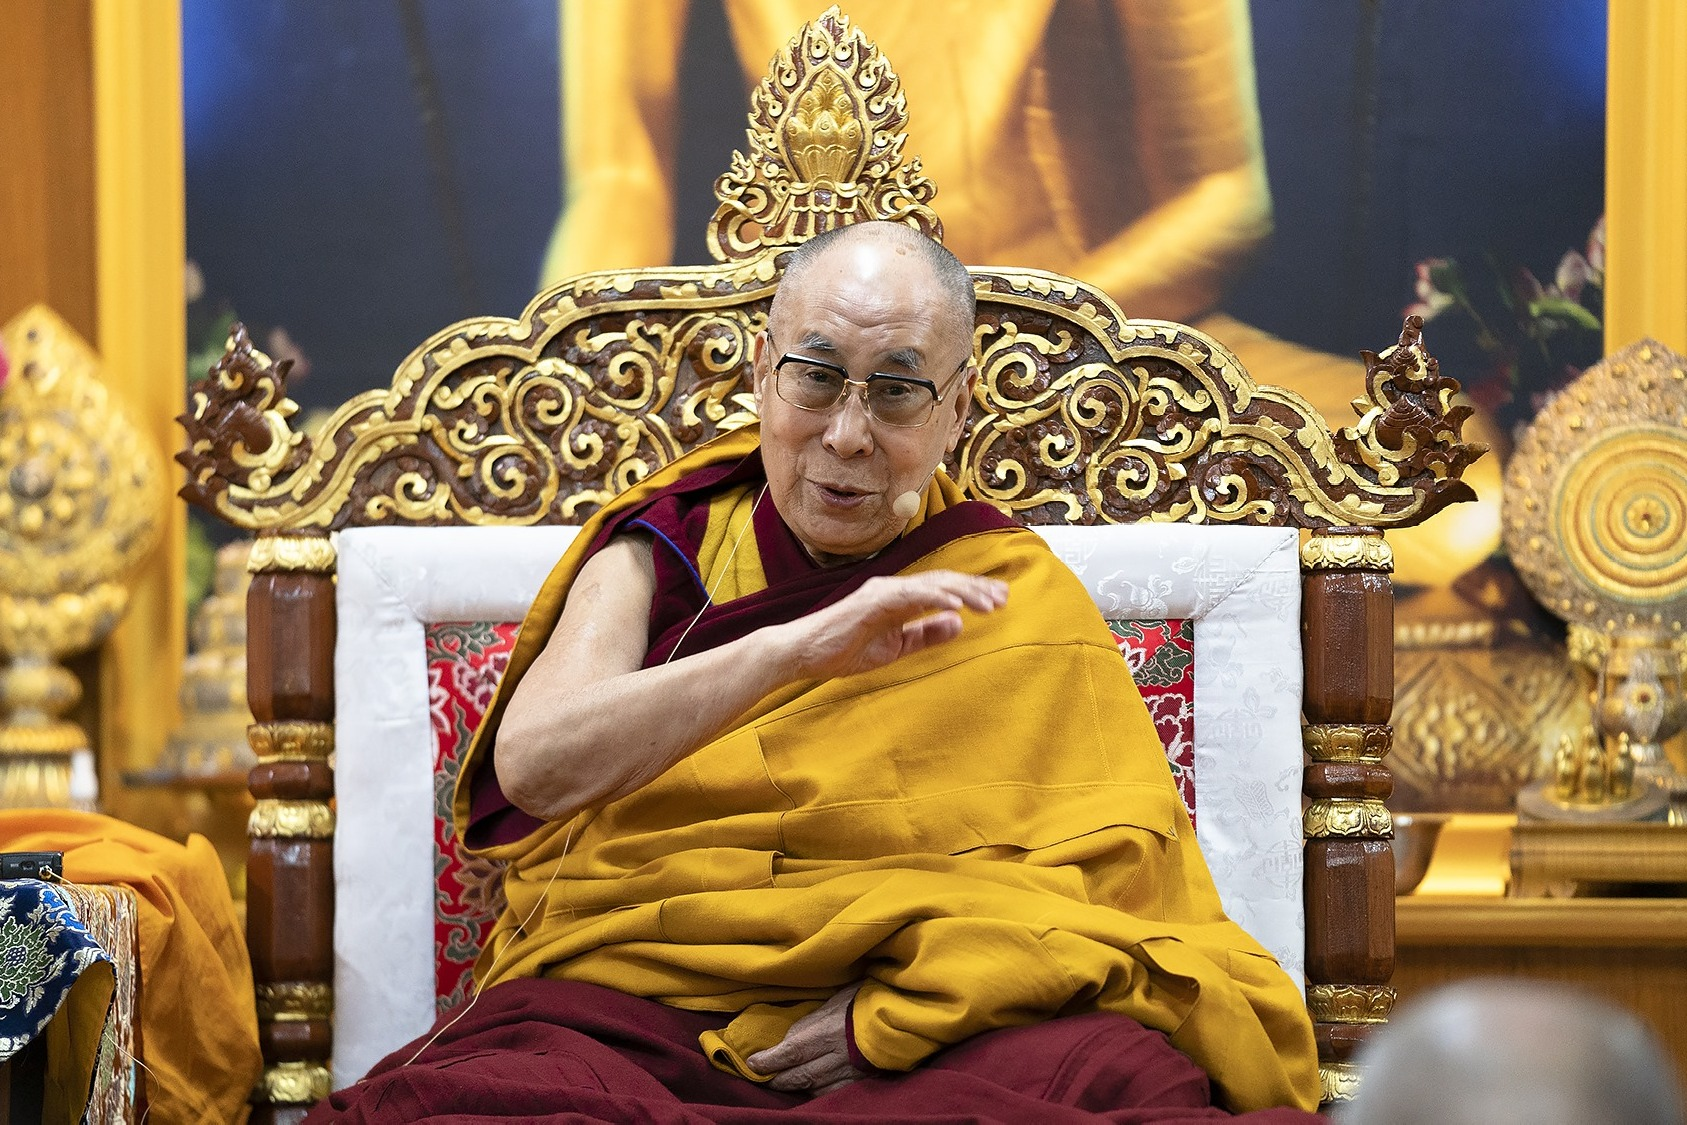 China Has No Right To Decide New Dalai Lama Says America